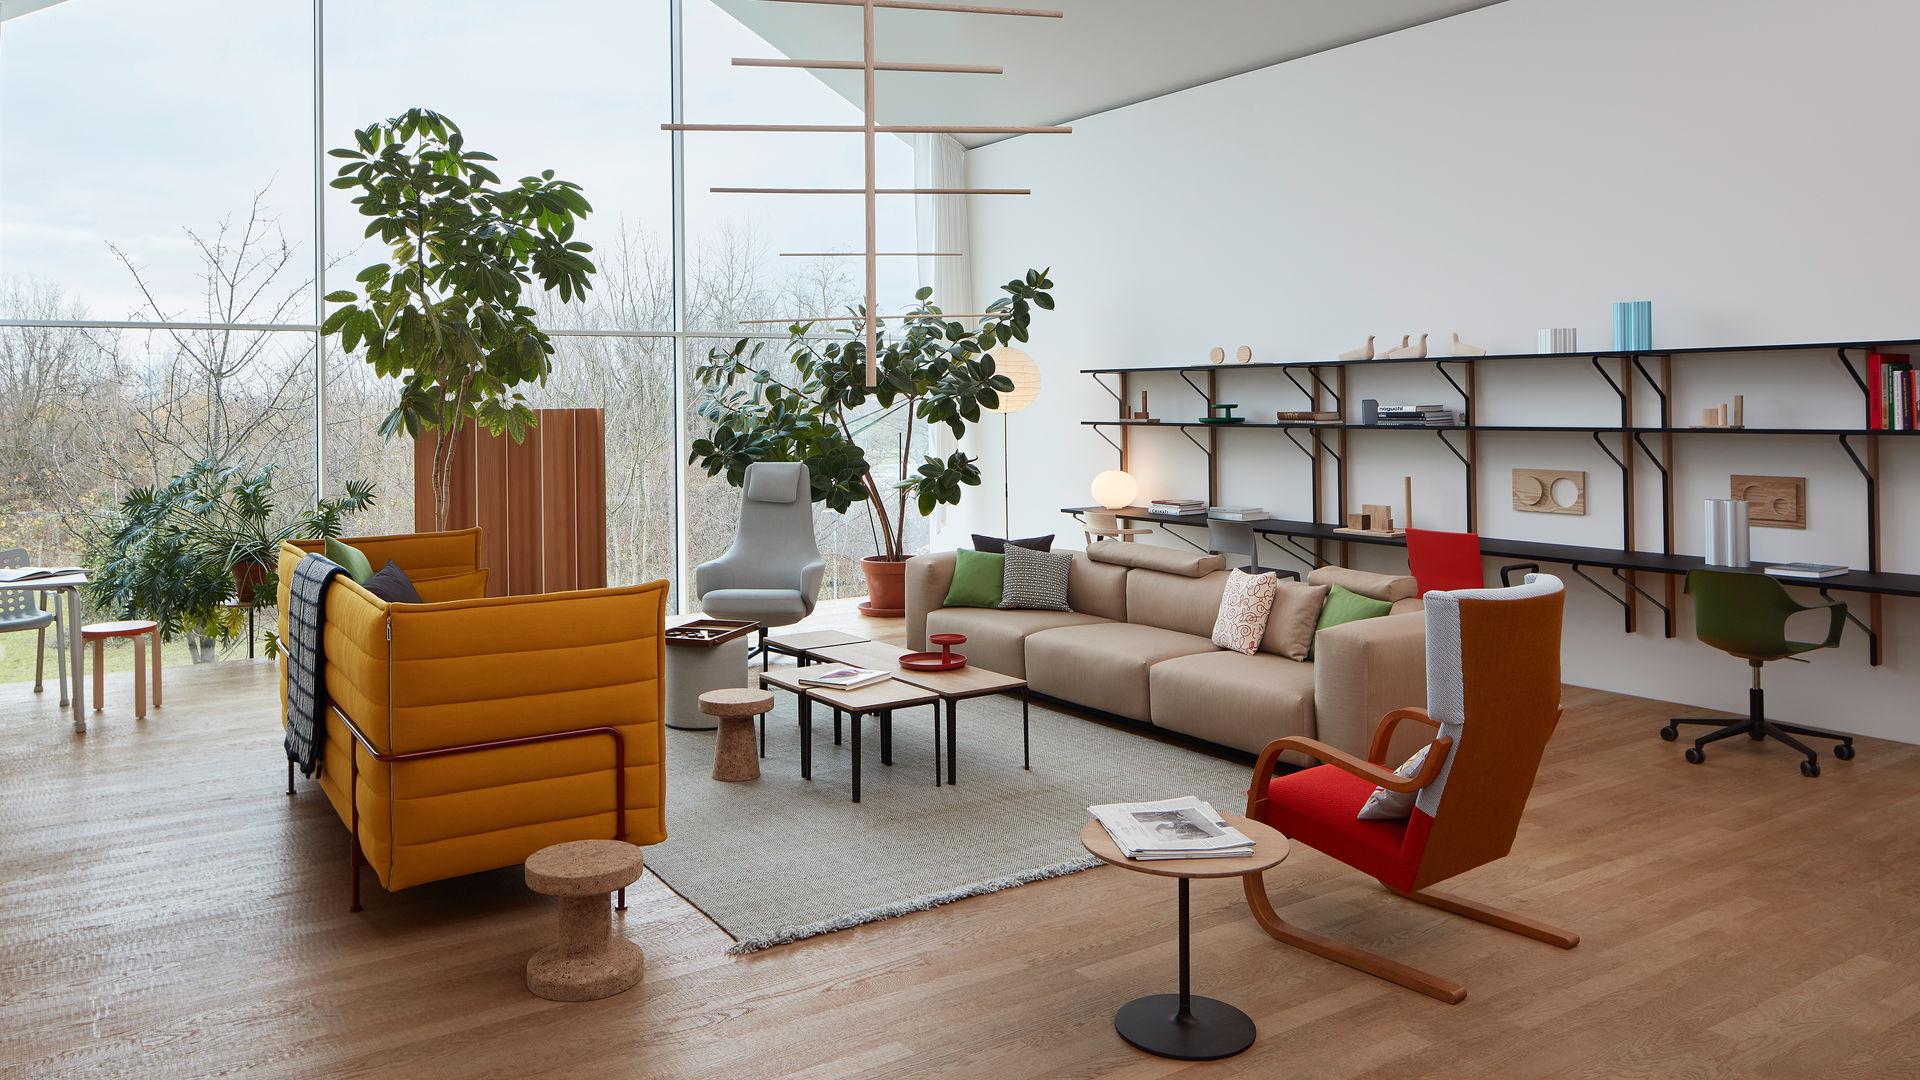 Haus Interior Design vitra vitrahaus